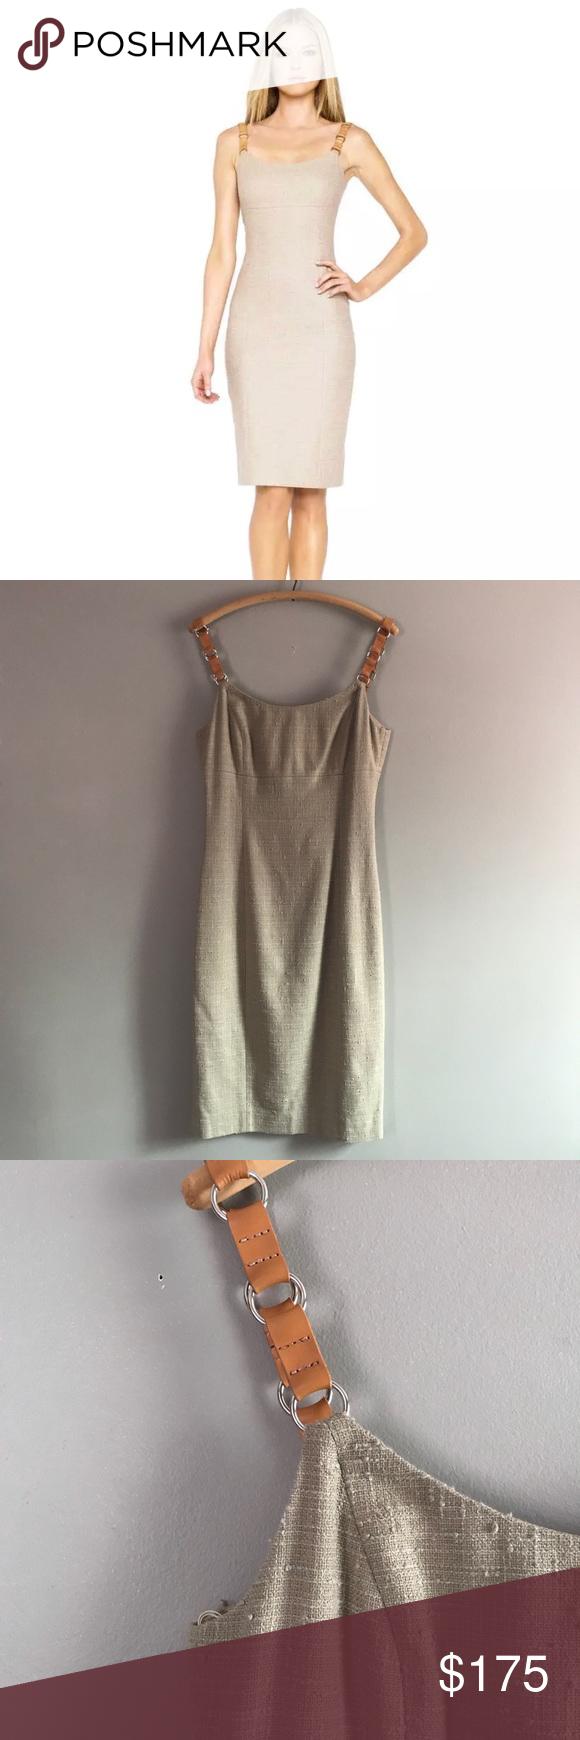 Michael Kors Collection Italy Linen Blend Dress   Michael ...